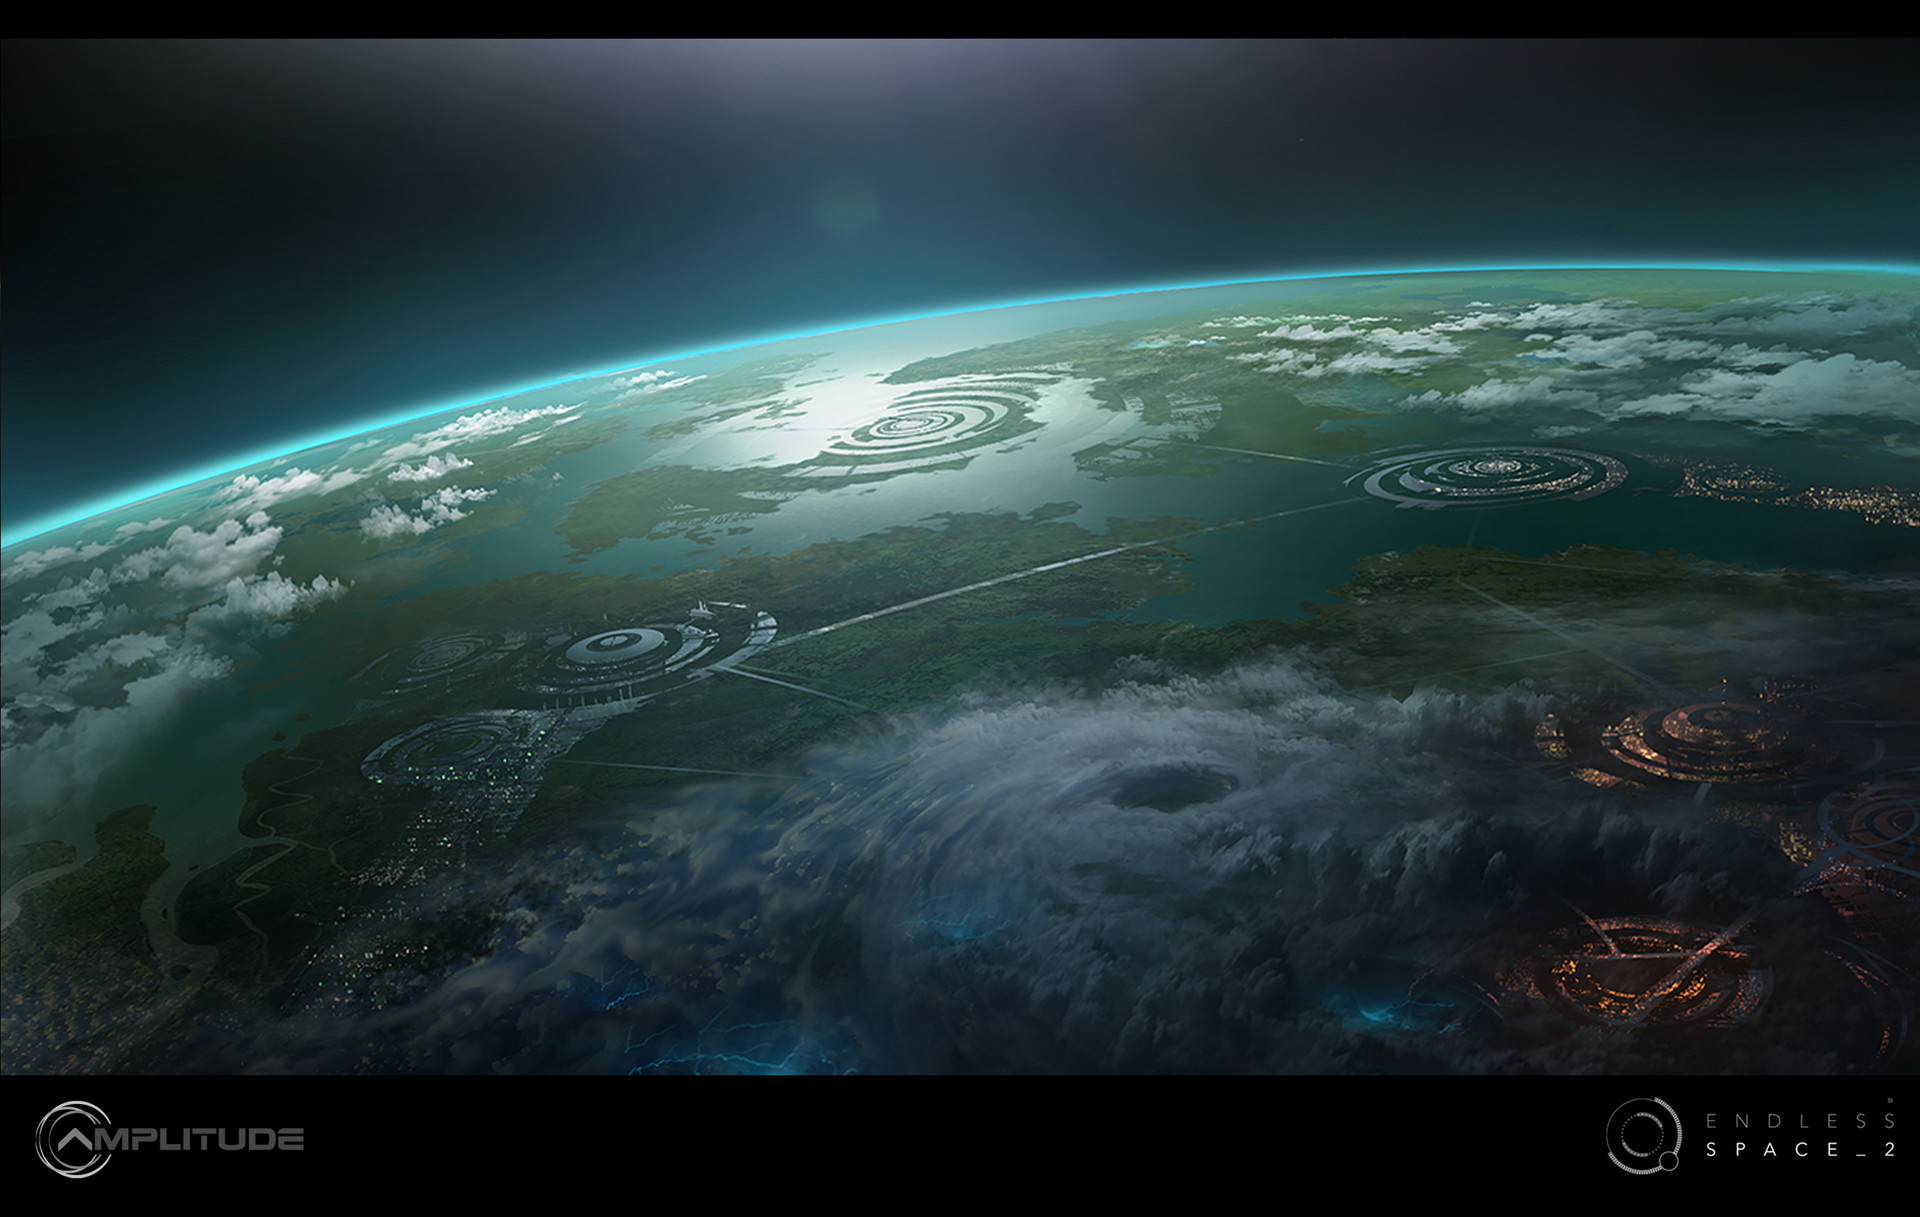 Endless Space 2 Concept Art